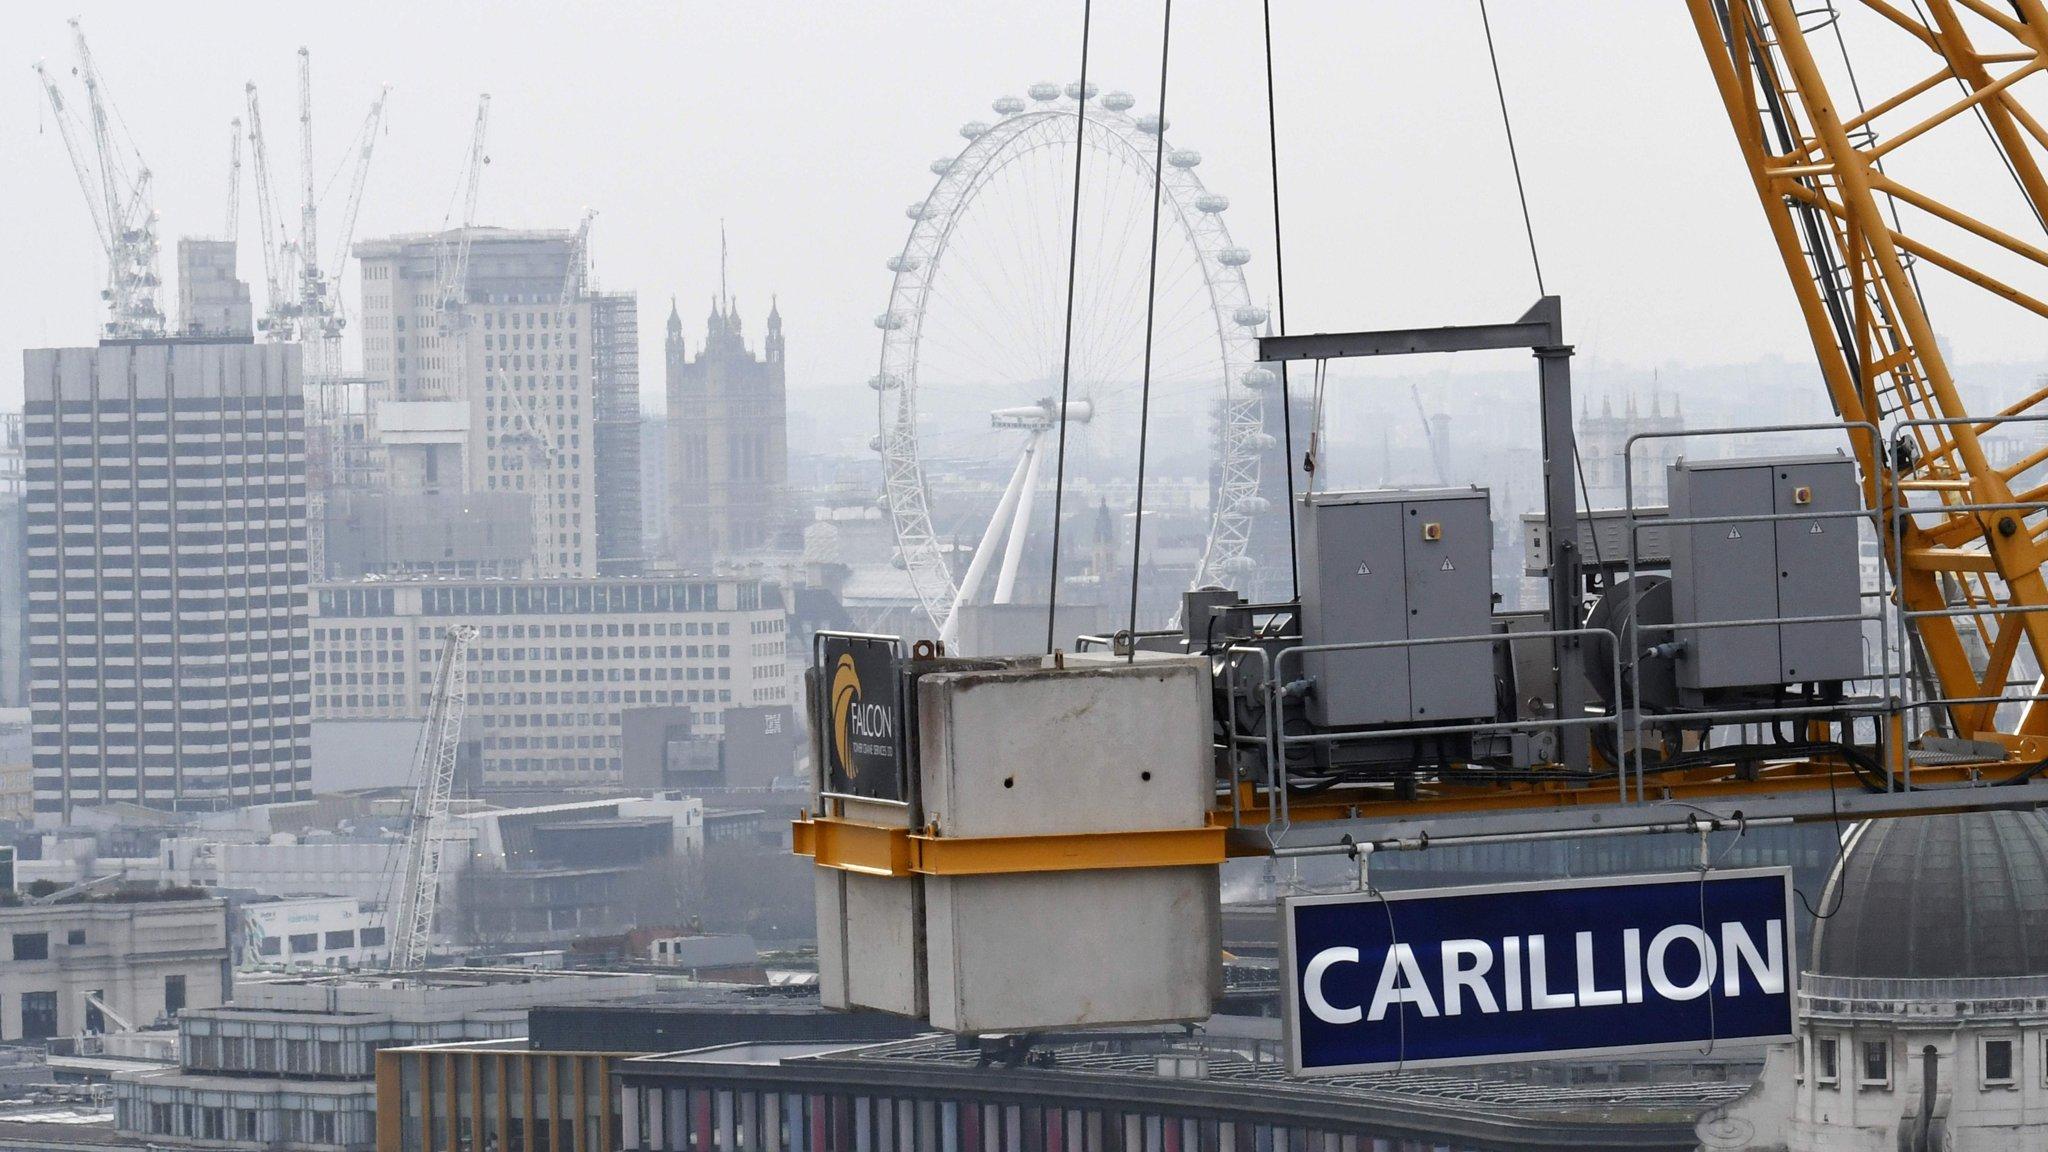 Trust in Carillion evaporates as it scrambles for cash